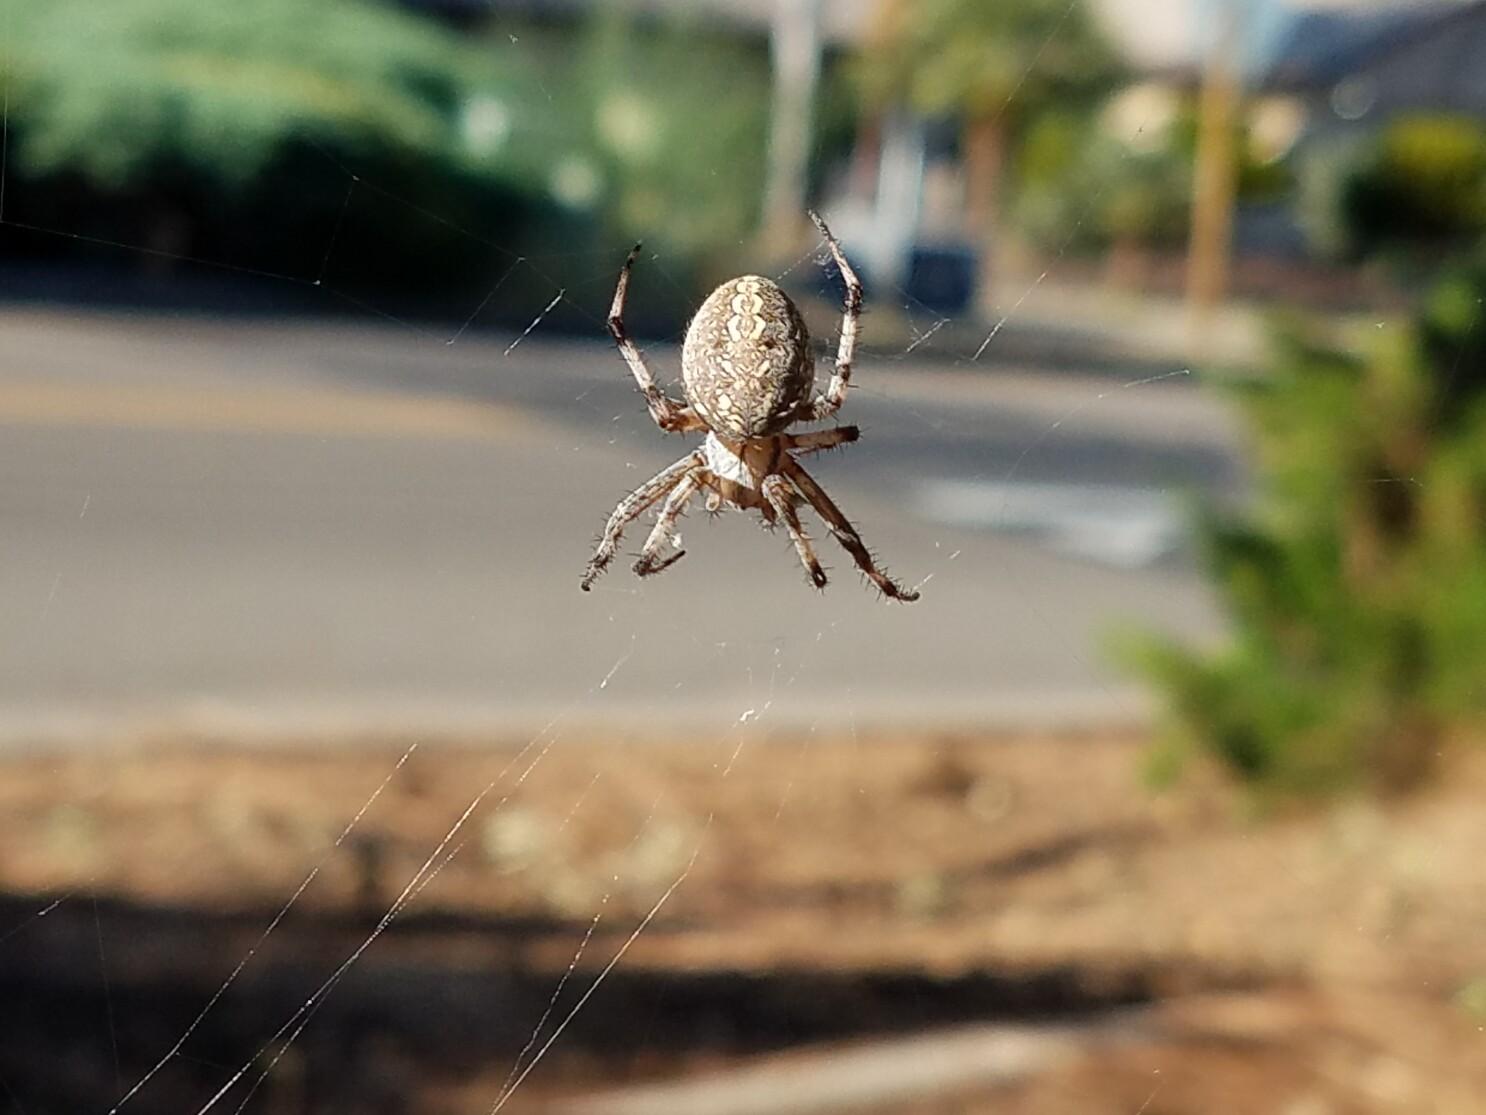 Arañas tejedoras de orbe: